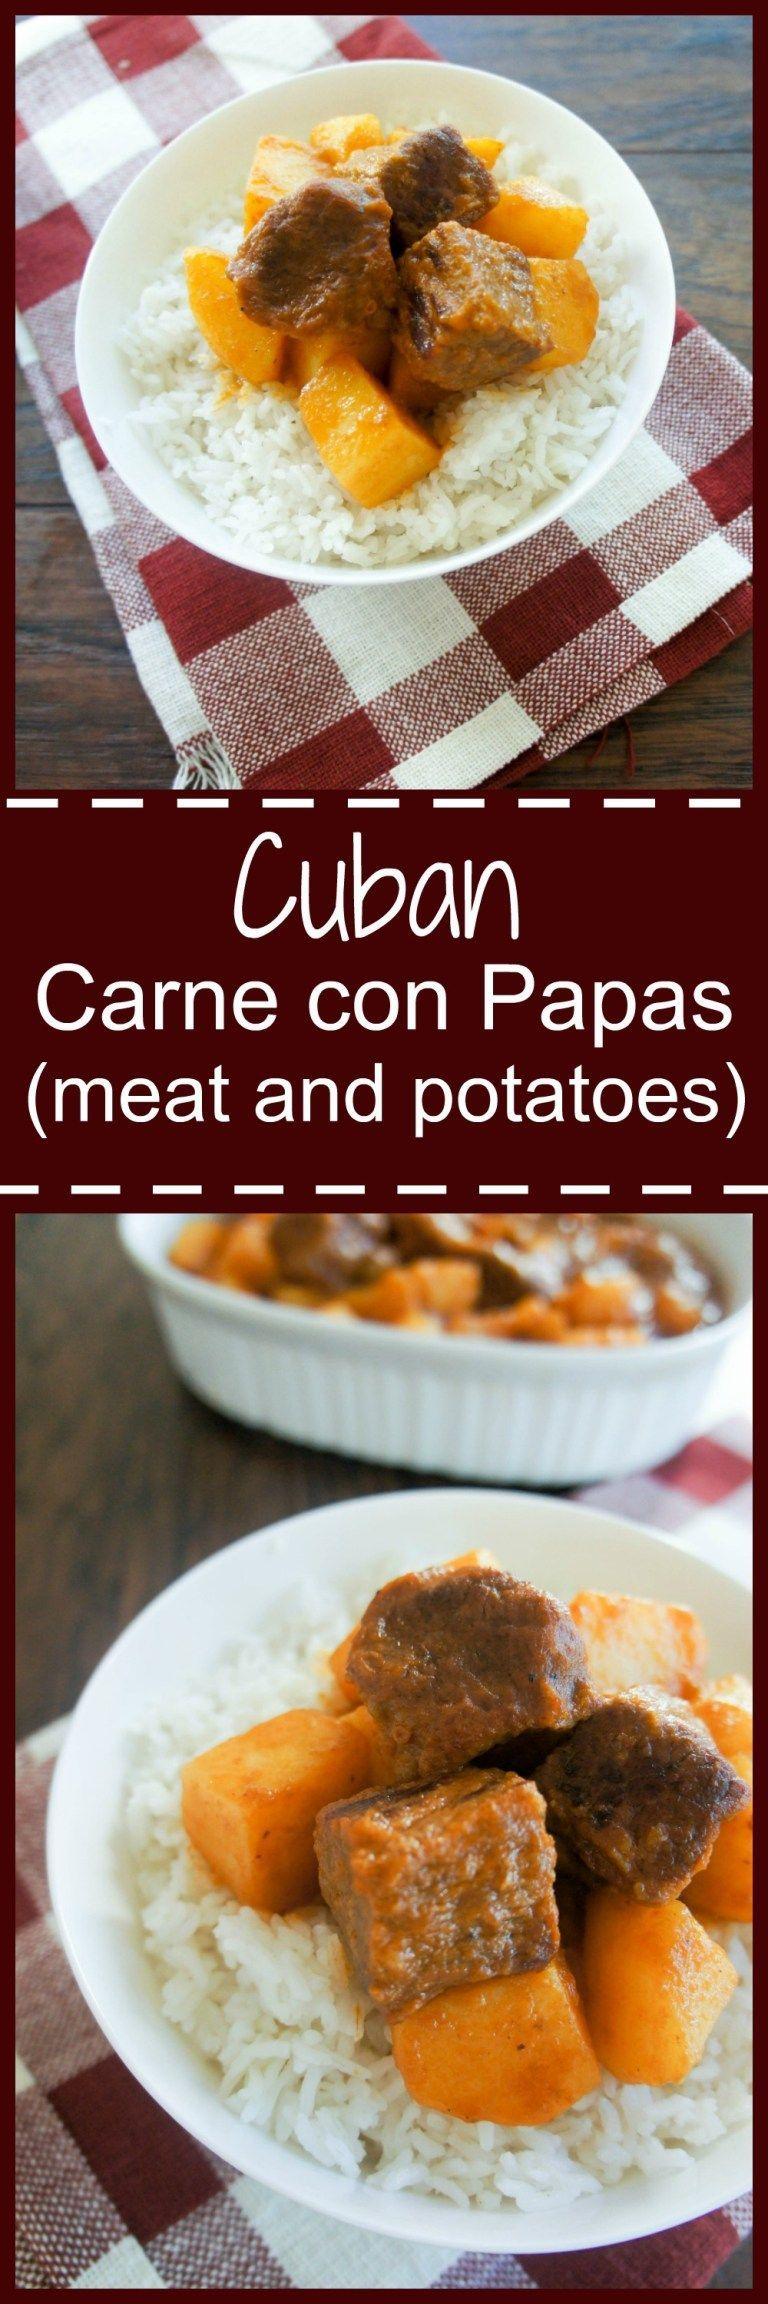 Cuban Meat & Potatoes (Carne con Papas #carneconpapas Cuban Carne Con Papas is the perfect comforting dinner the whole family will love! #carneconpapas